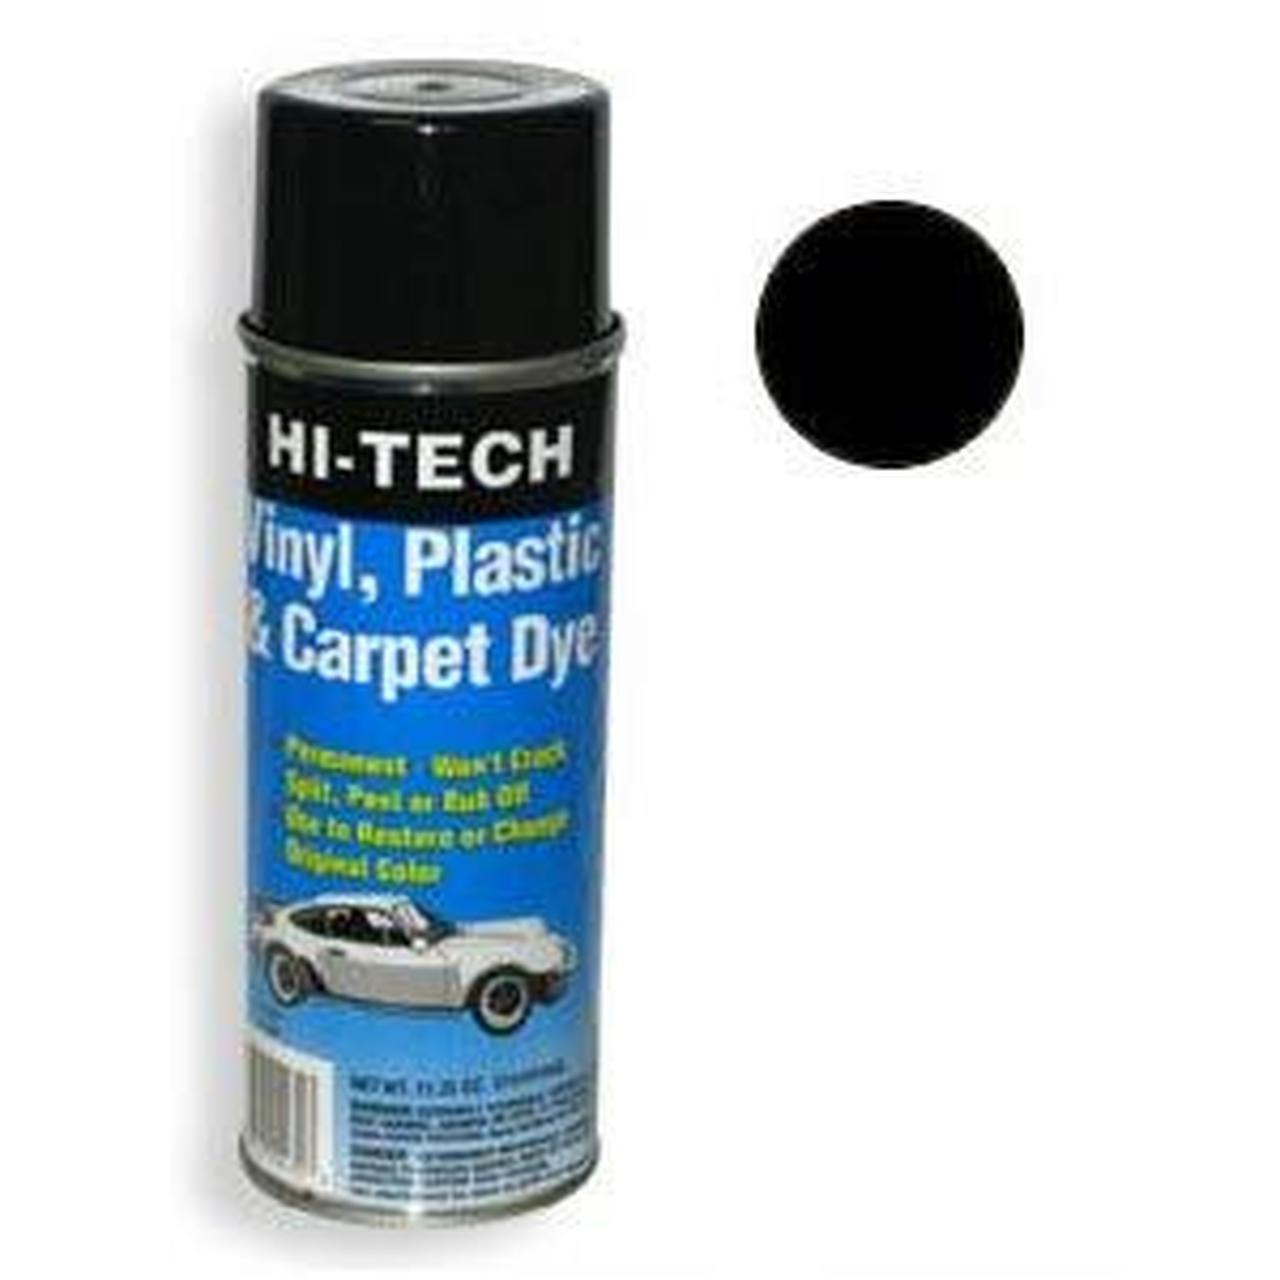 Vinyl, Plastic & Carpet Dye-Black